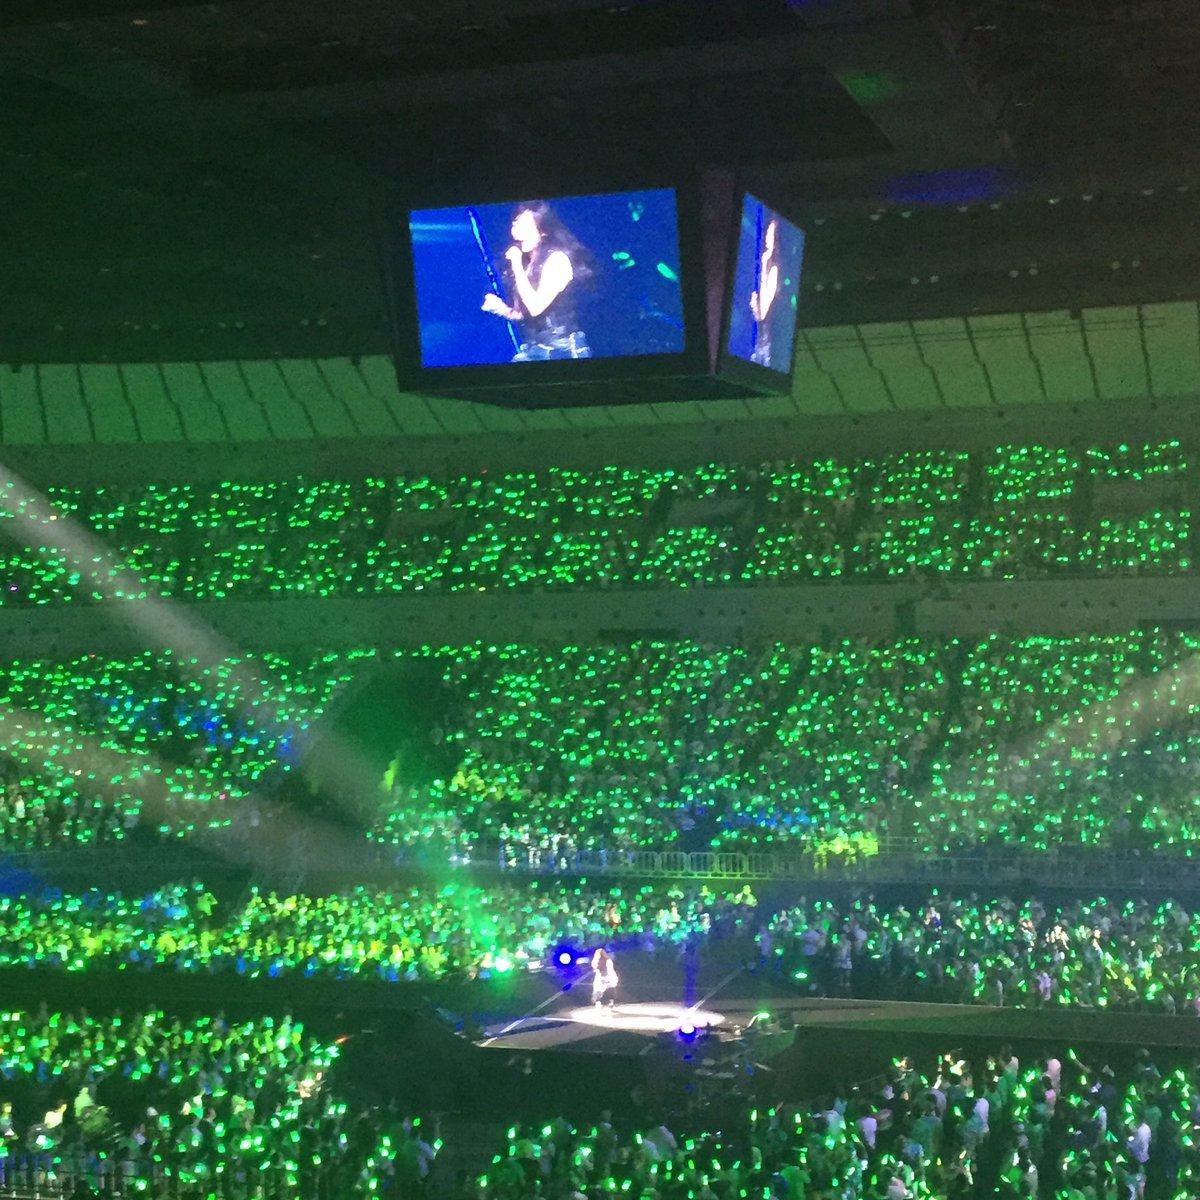 緑一色          (代筆妻) https://t.co/ohGGYUOGHw